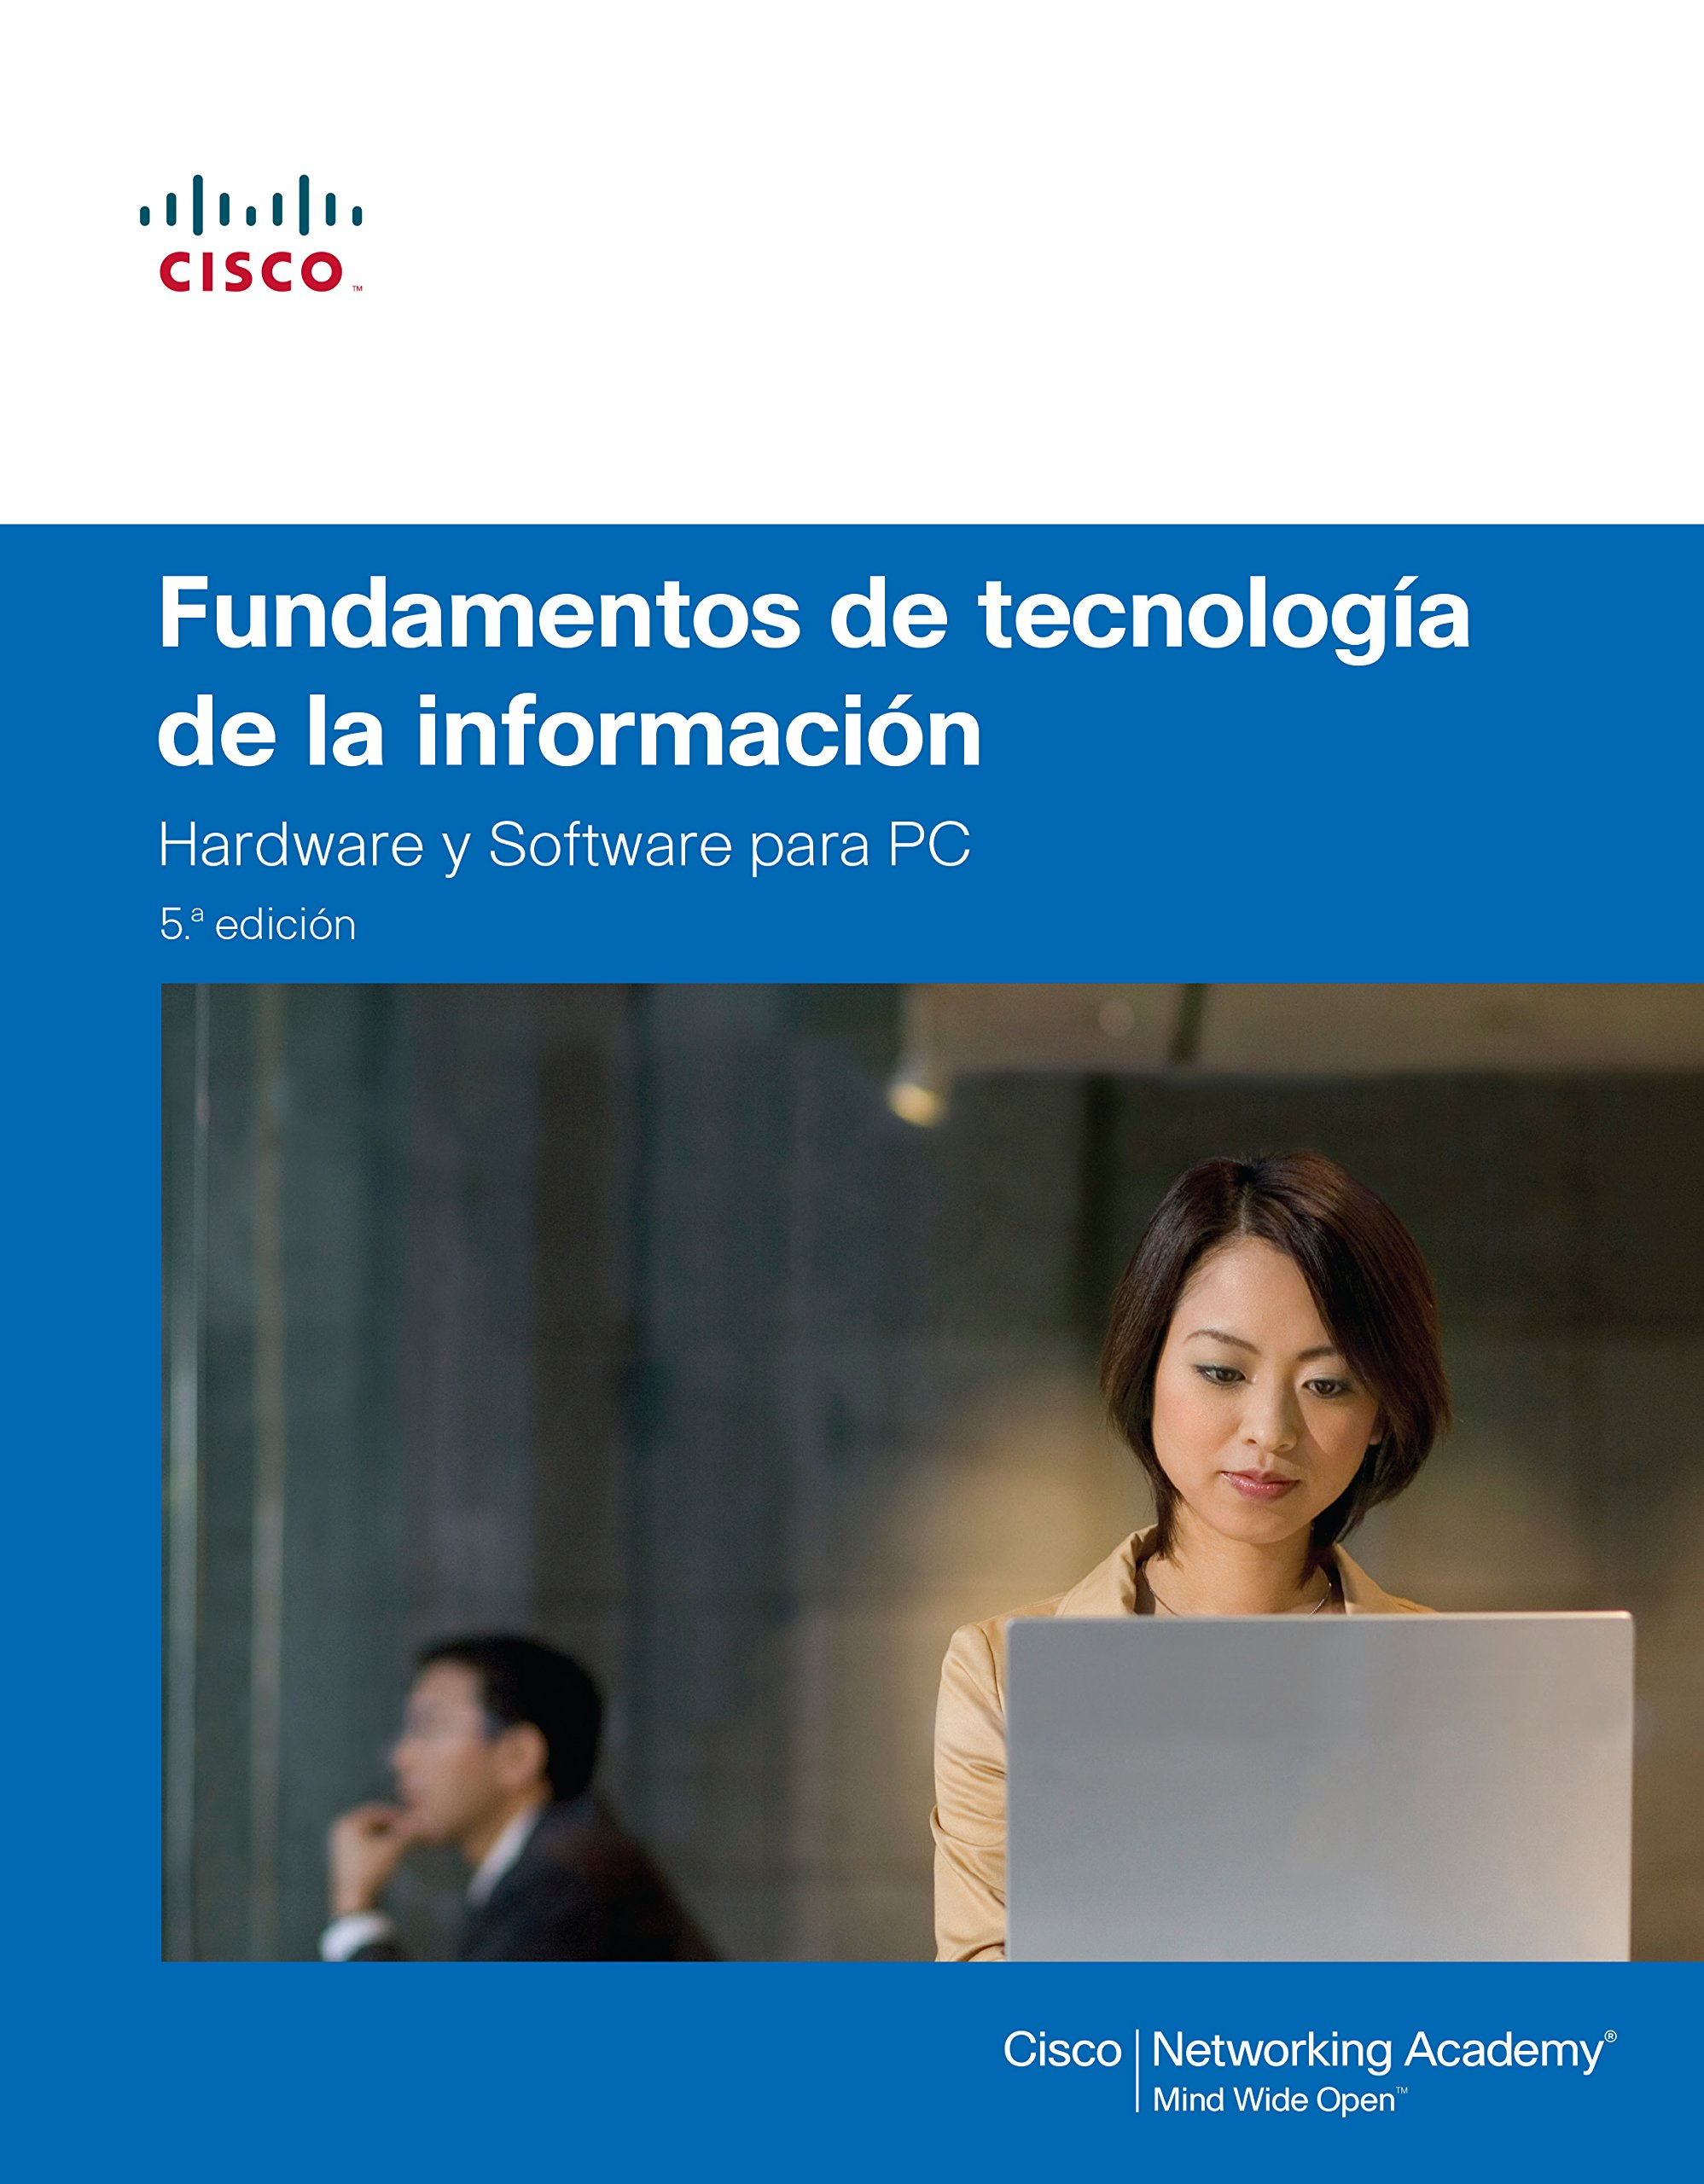 Fundamentos De Tecnologia De La Información. Cisco Comptia A+ (Cisco Press) Tapa blanda – 30 may 2014 Cisco Networking Academy Pearson 8490354715